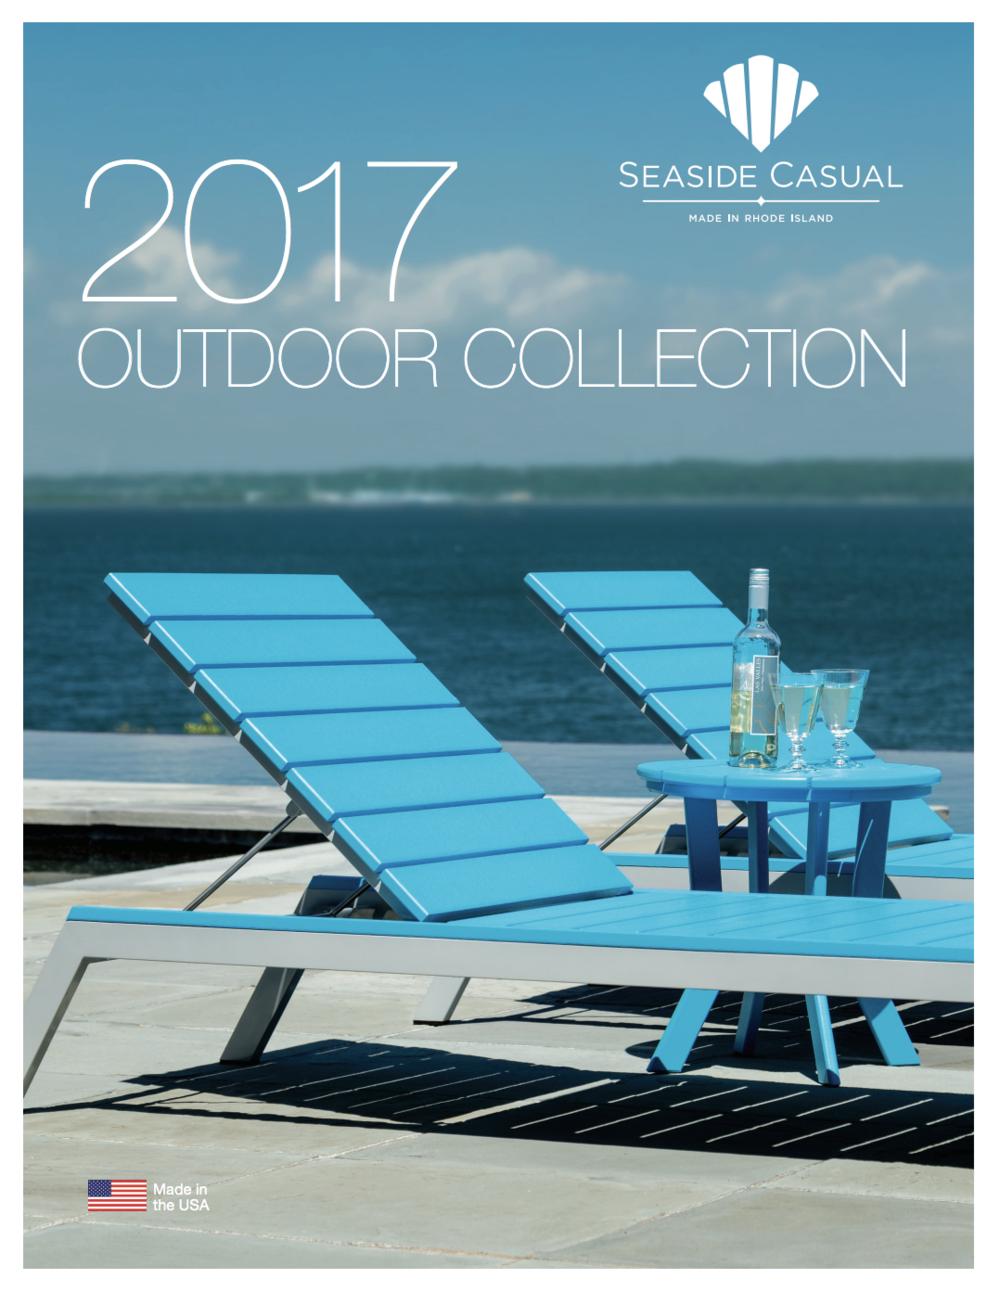 Seaside Casual 2017